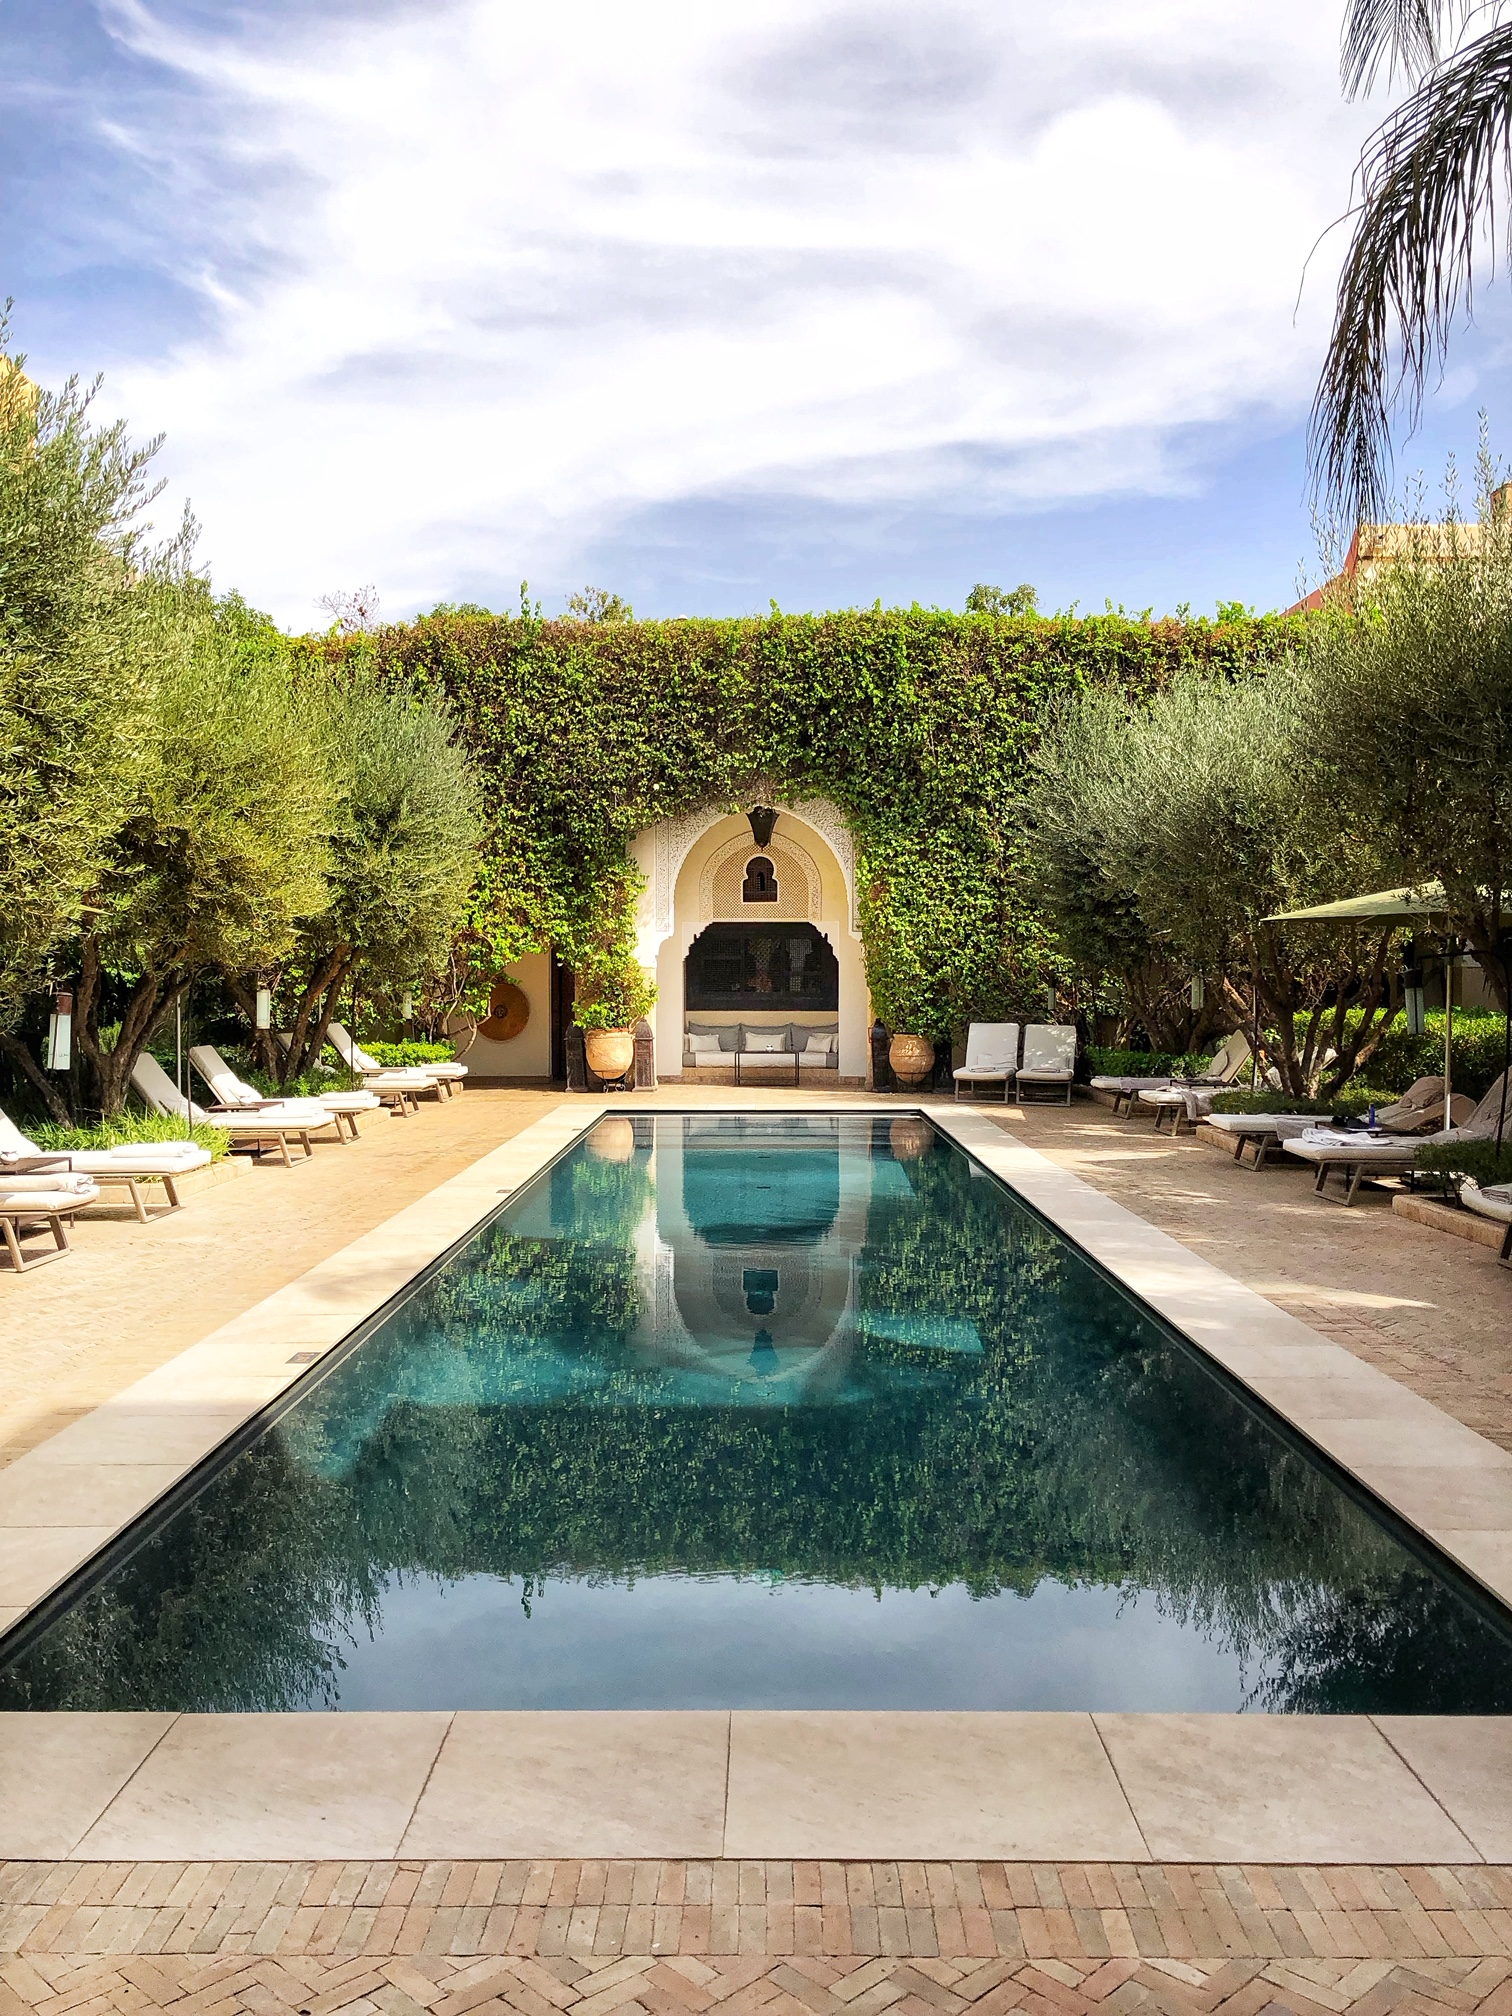 hotel villa des orangers, marrakech, the-alyst.com